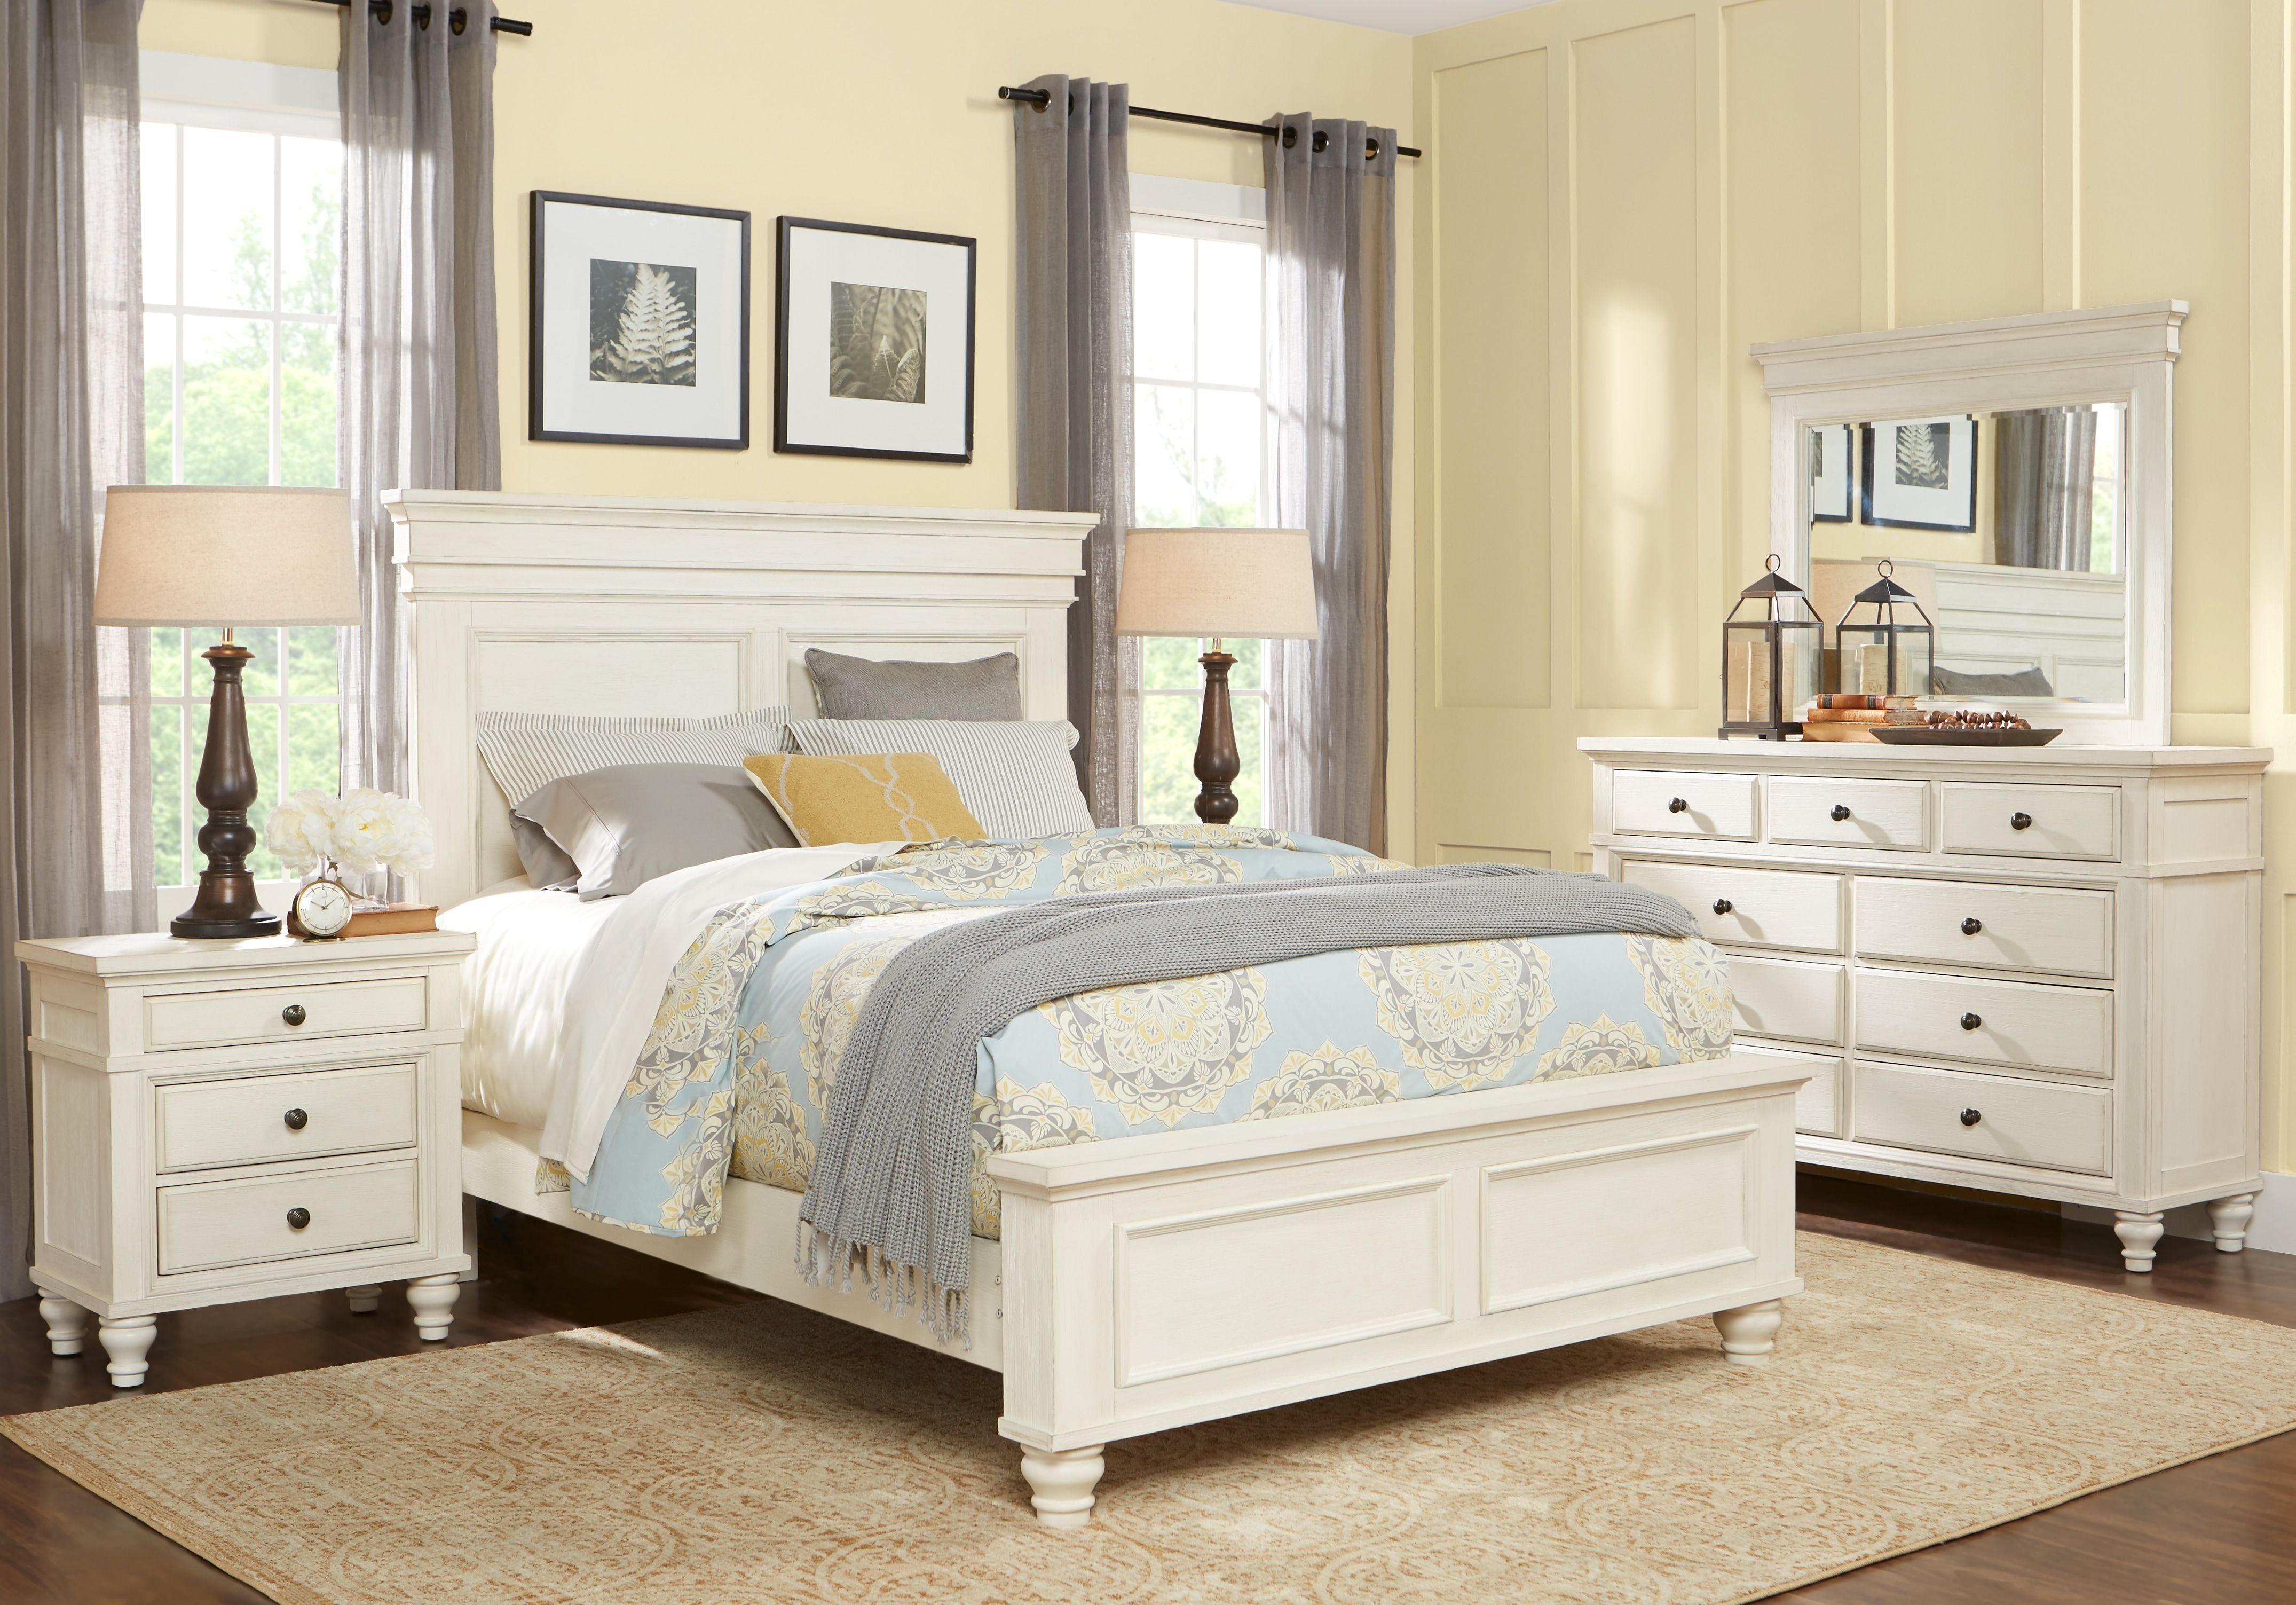 Lake Town Off-White 5 Pc King Panel Bedroom | King bedroom ...